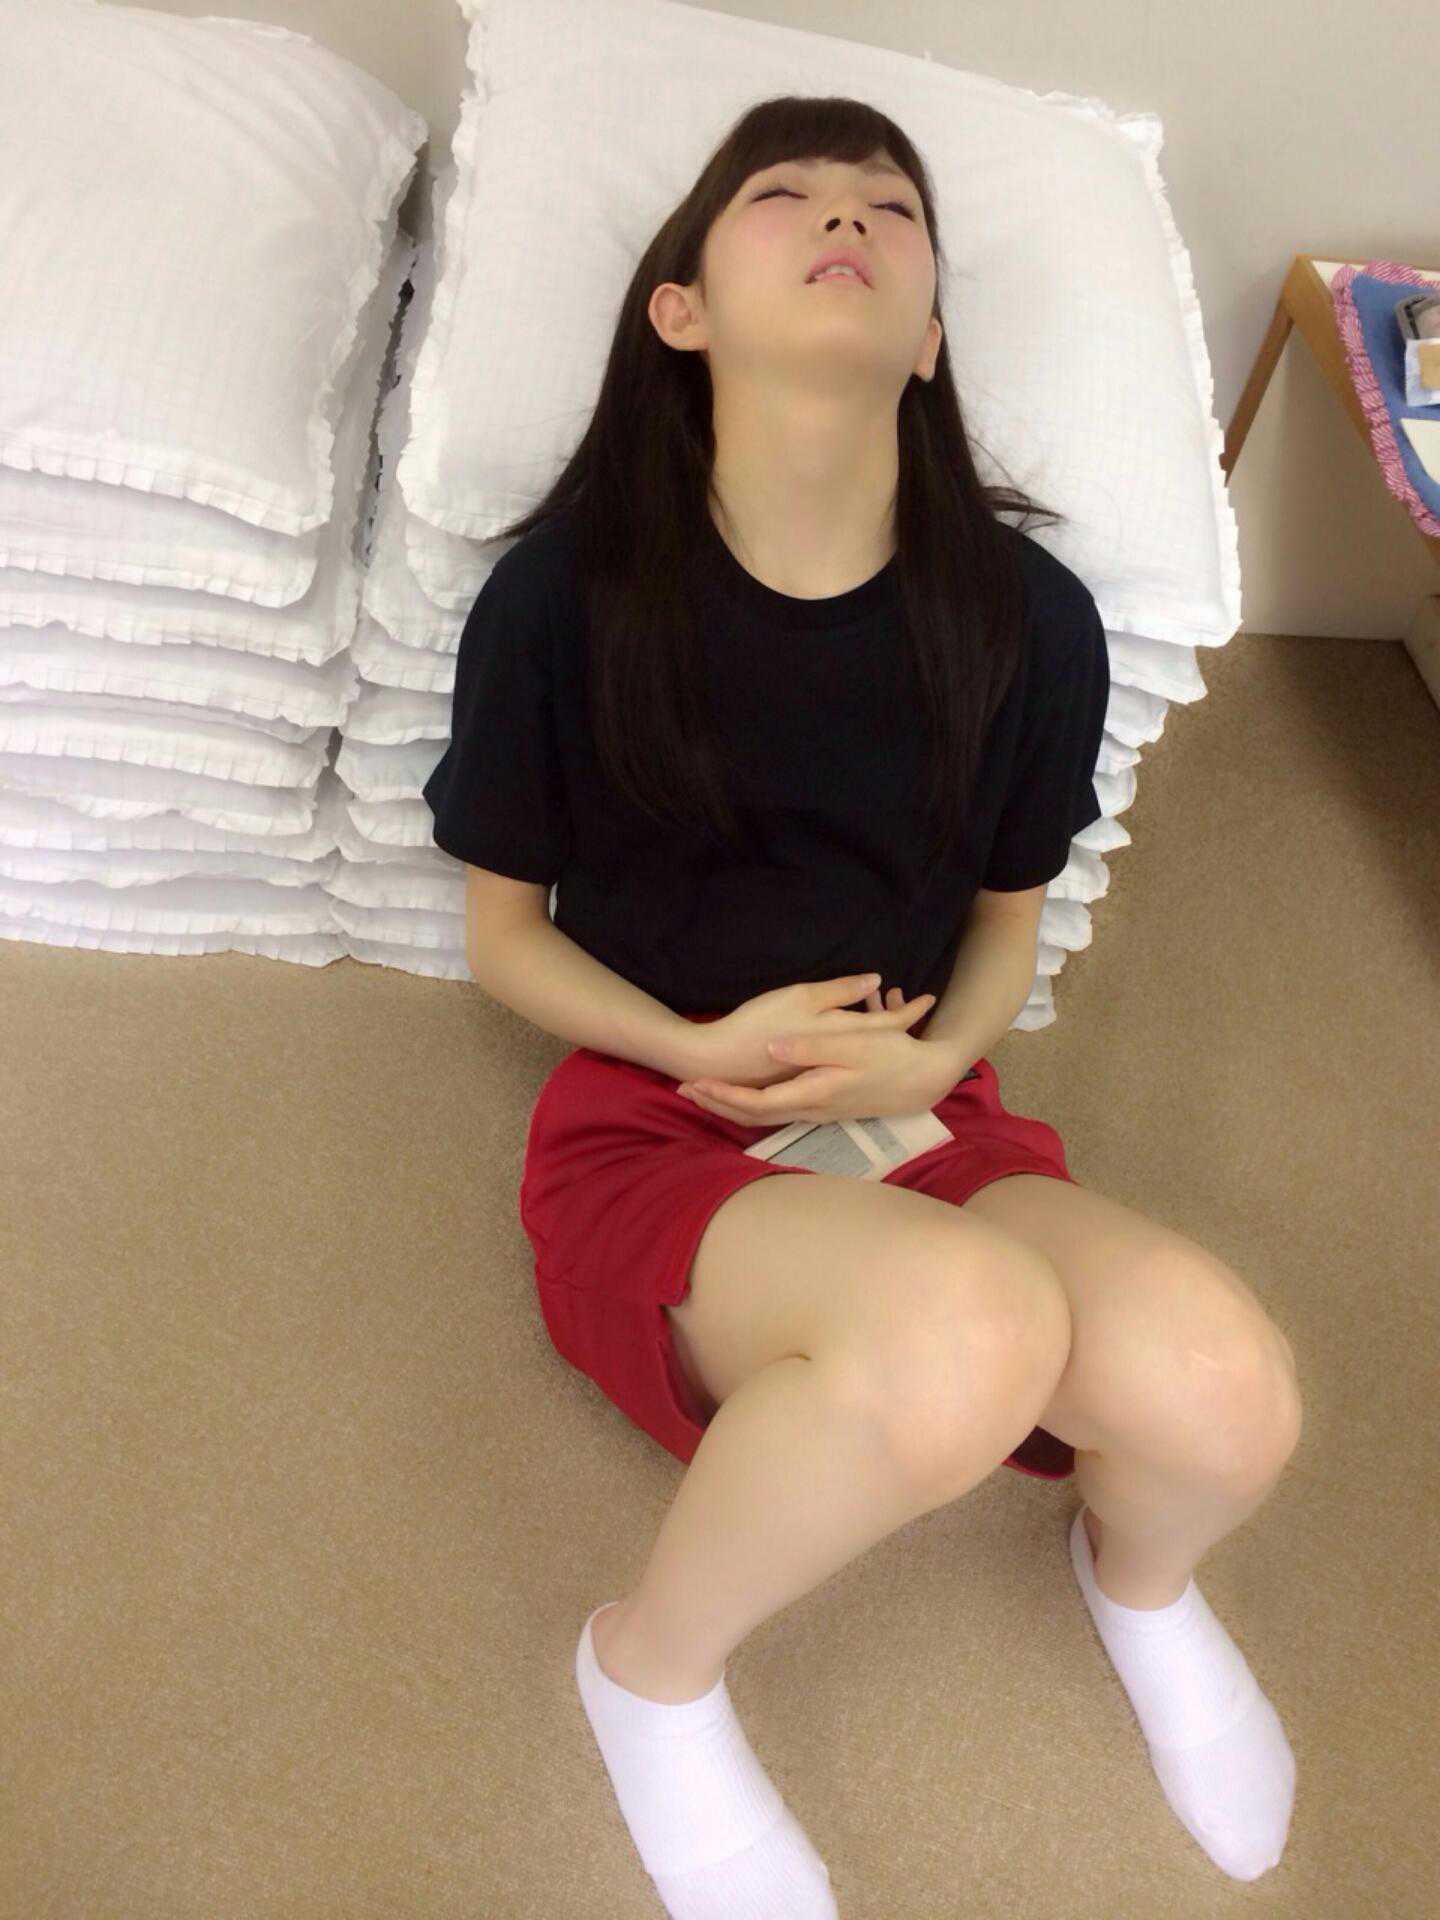 okada nana sleeping